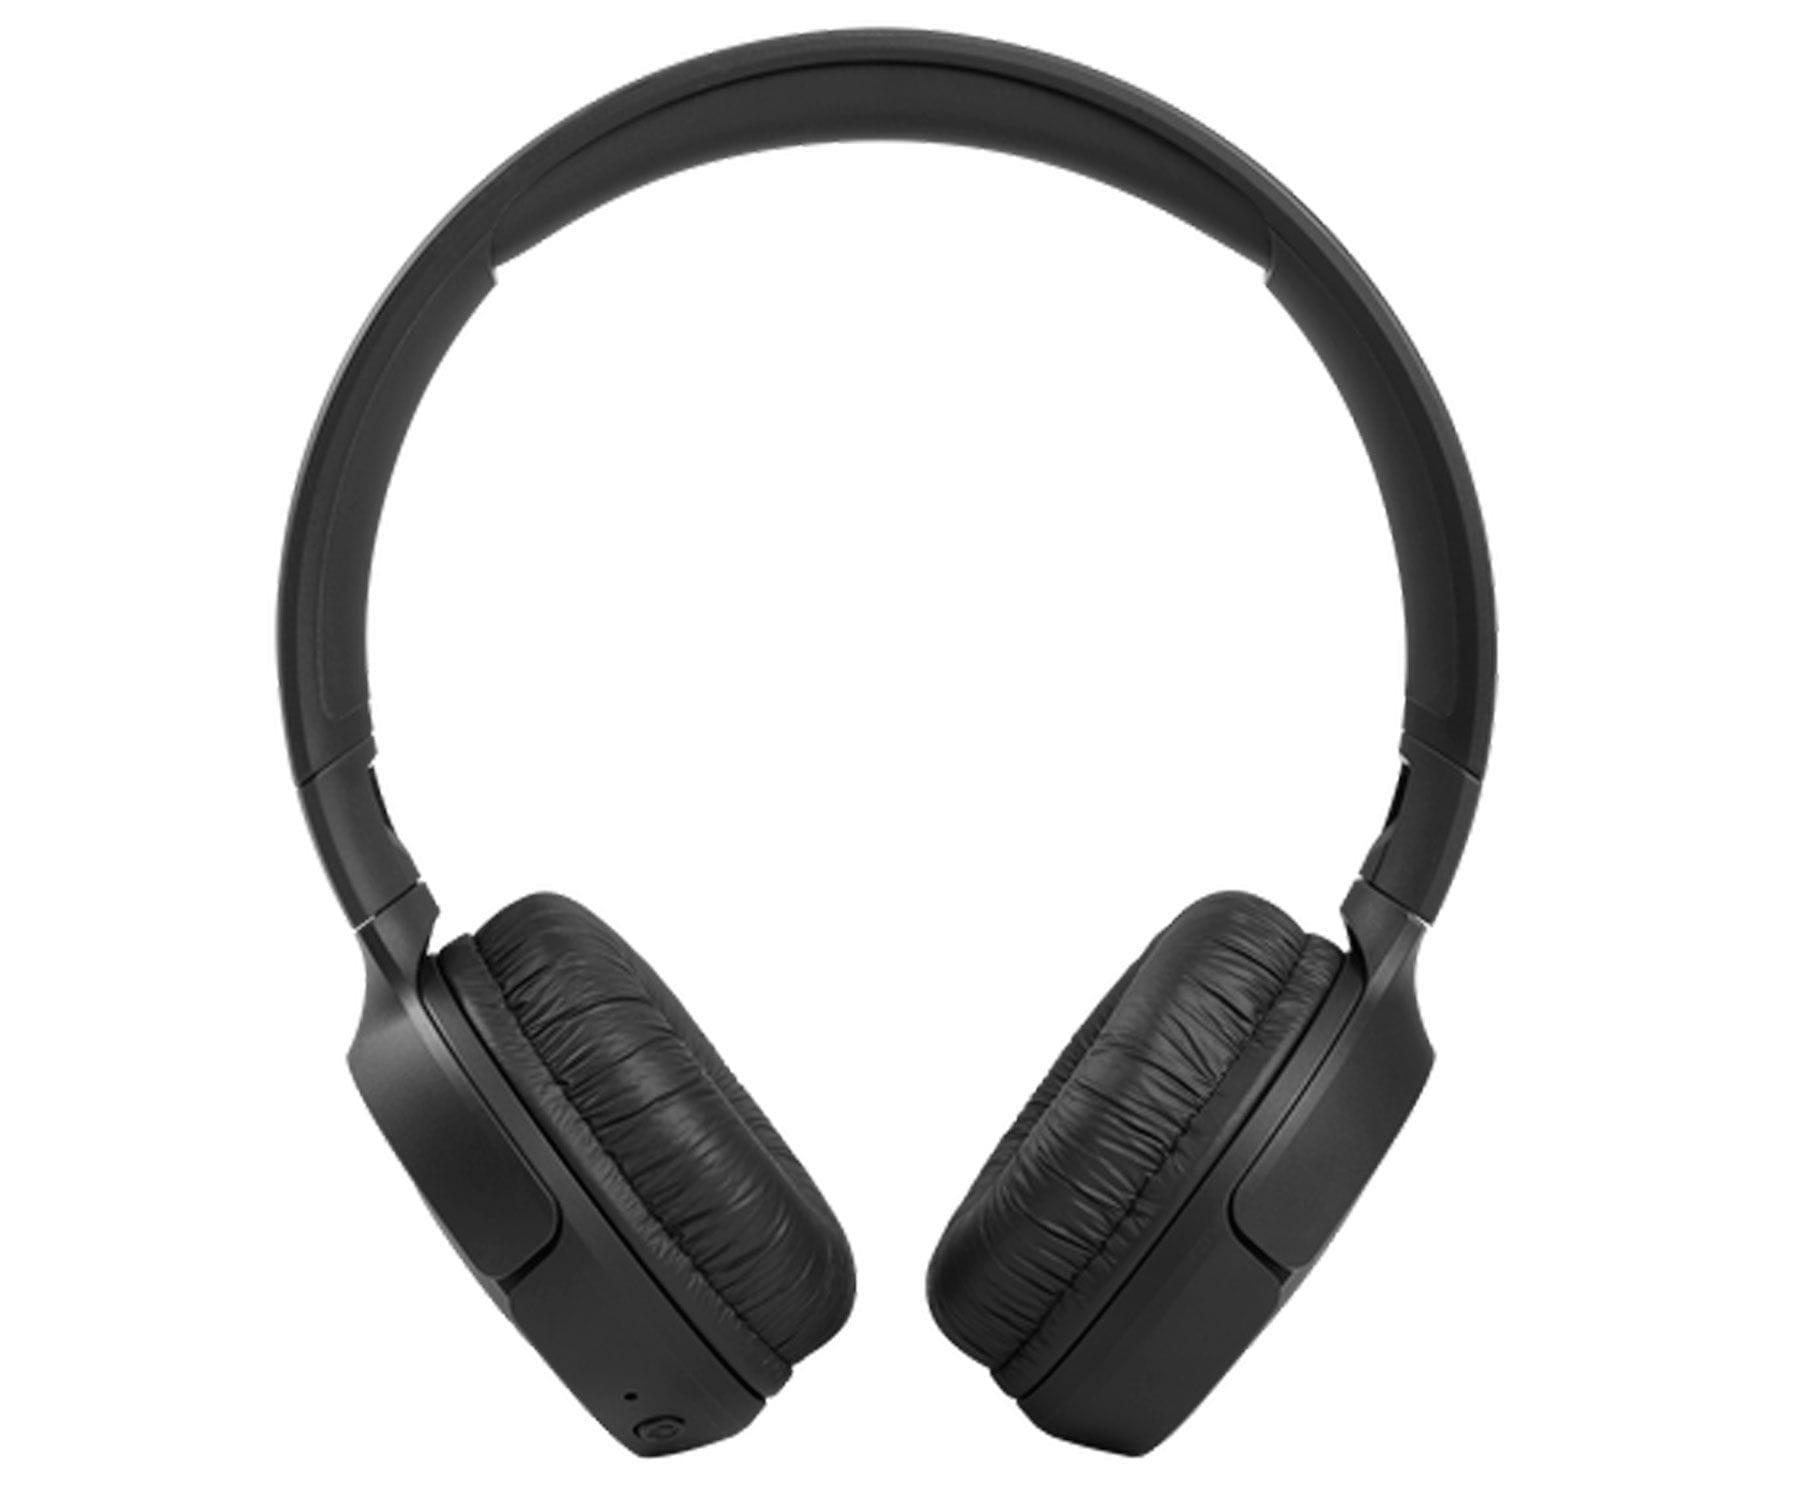 JBL Tune 510 BT Negro/Auriculares inalámbricos Bluetooth JBL Pure Bass